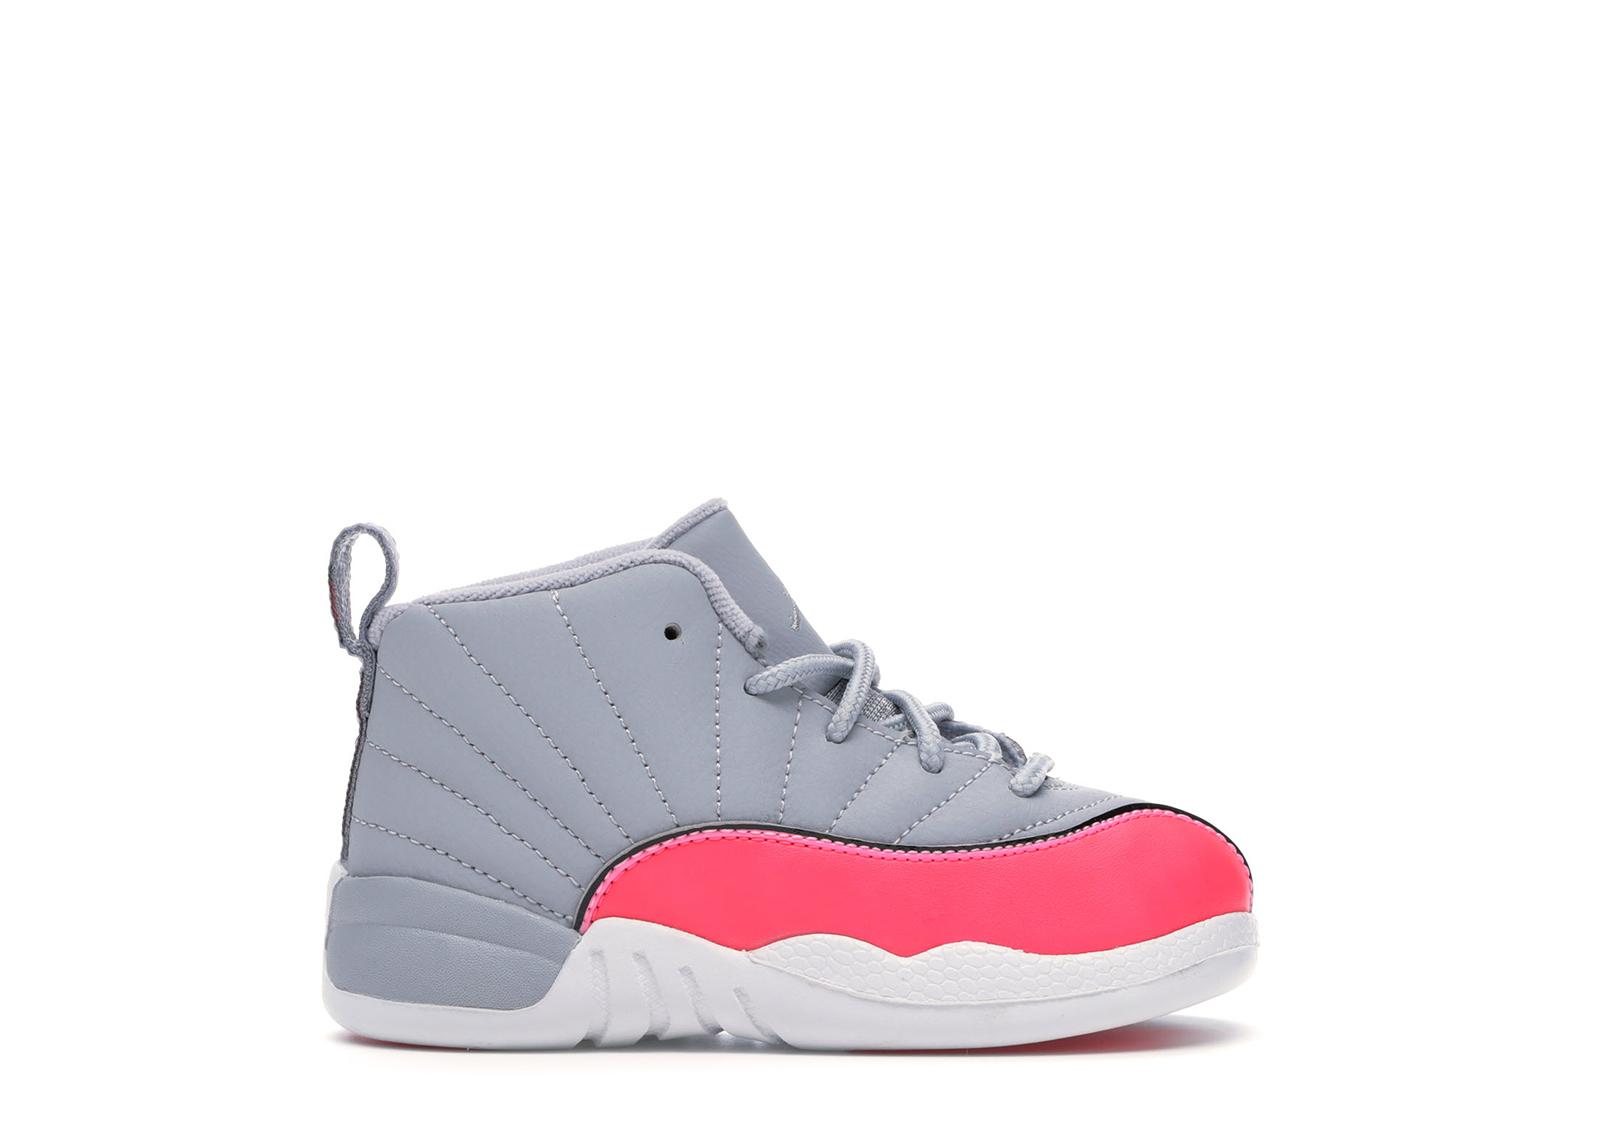 Jordan 12 Retro Wolf Grey Racer Pink